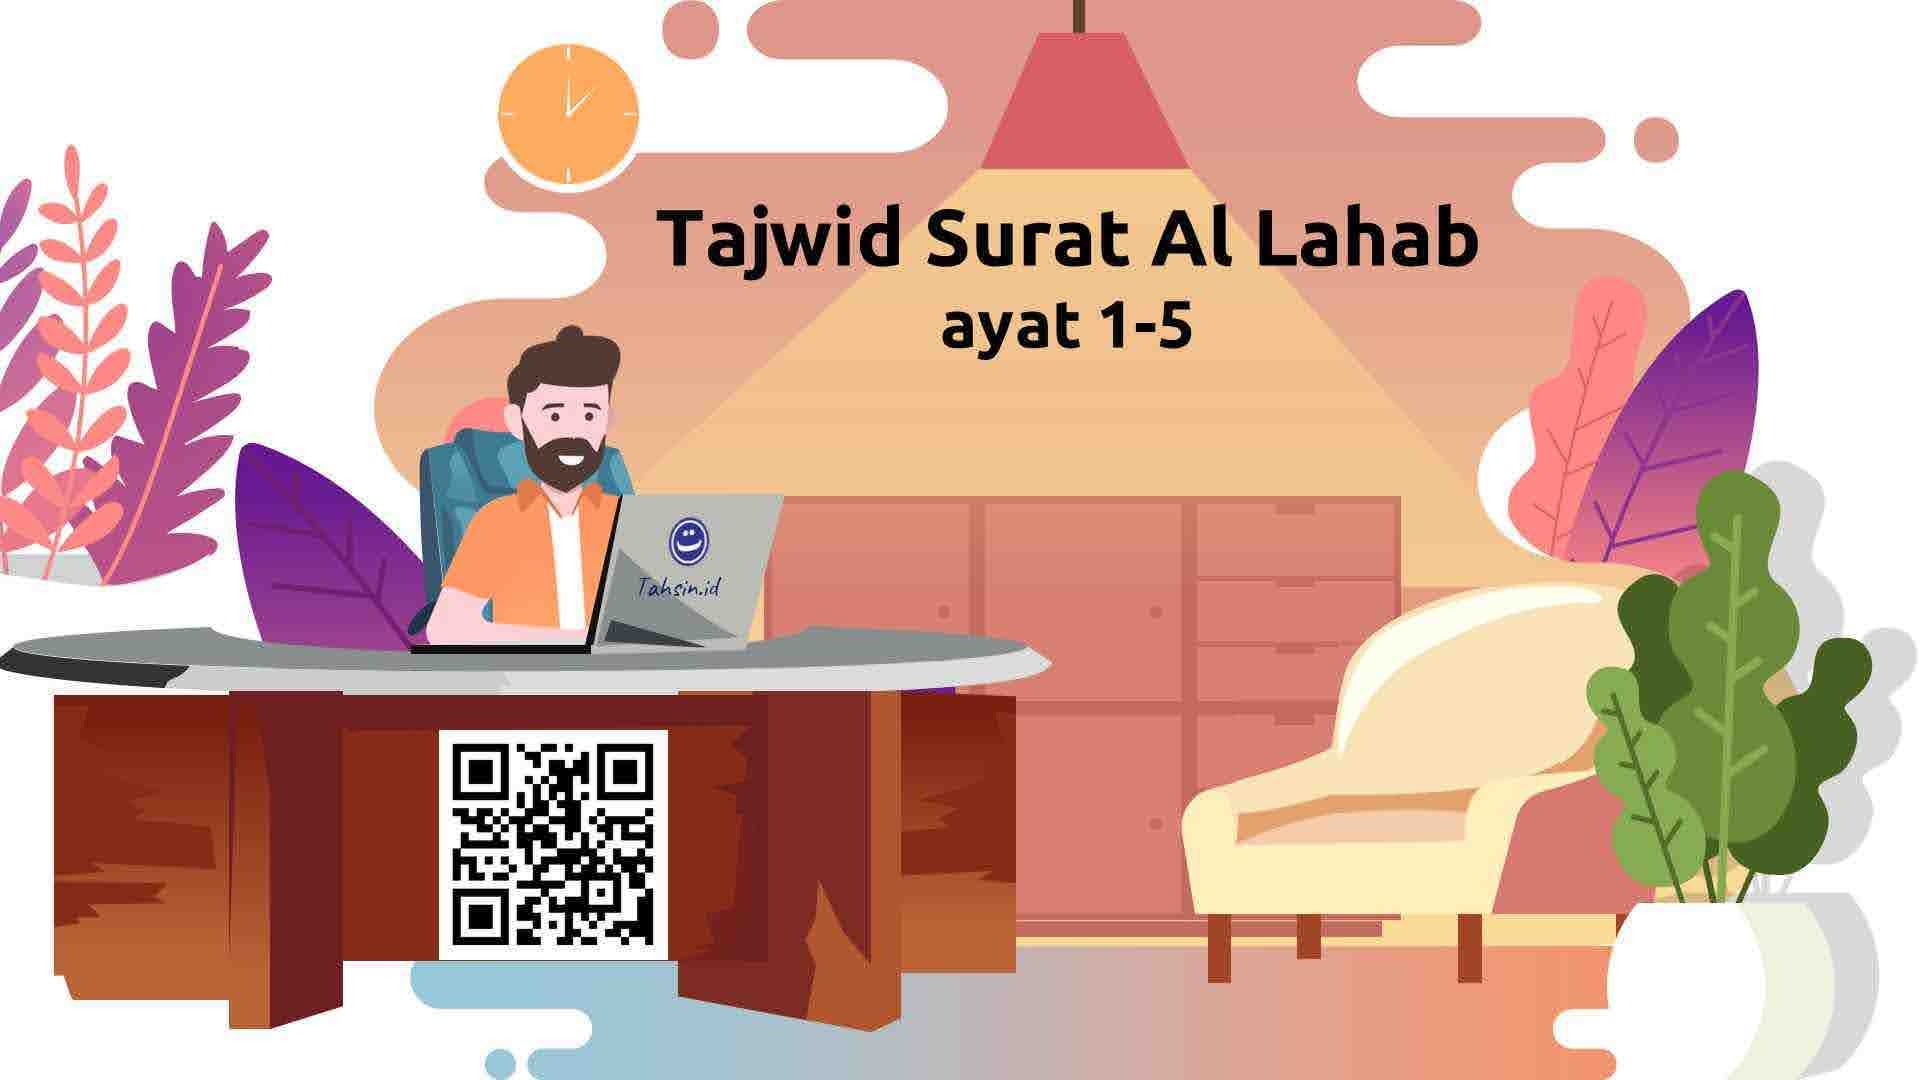 tajwid-surat-al-lahab